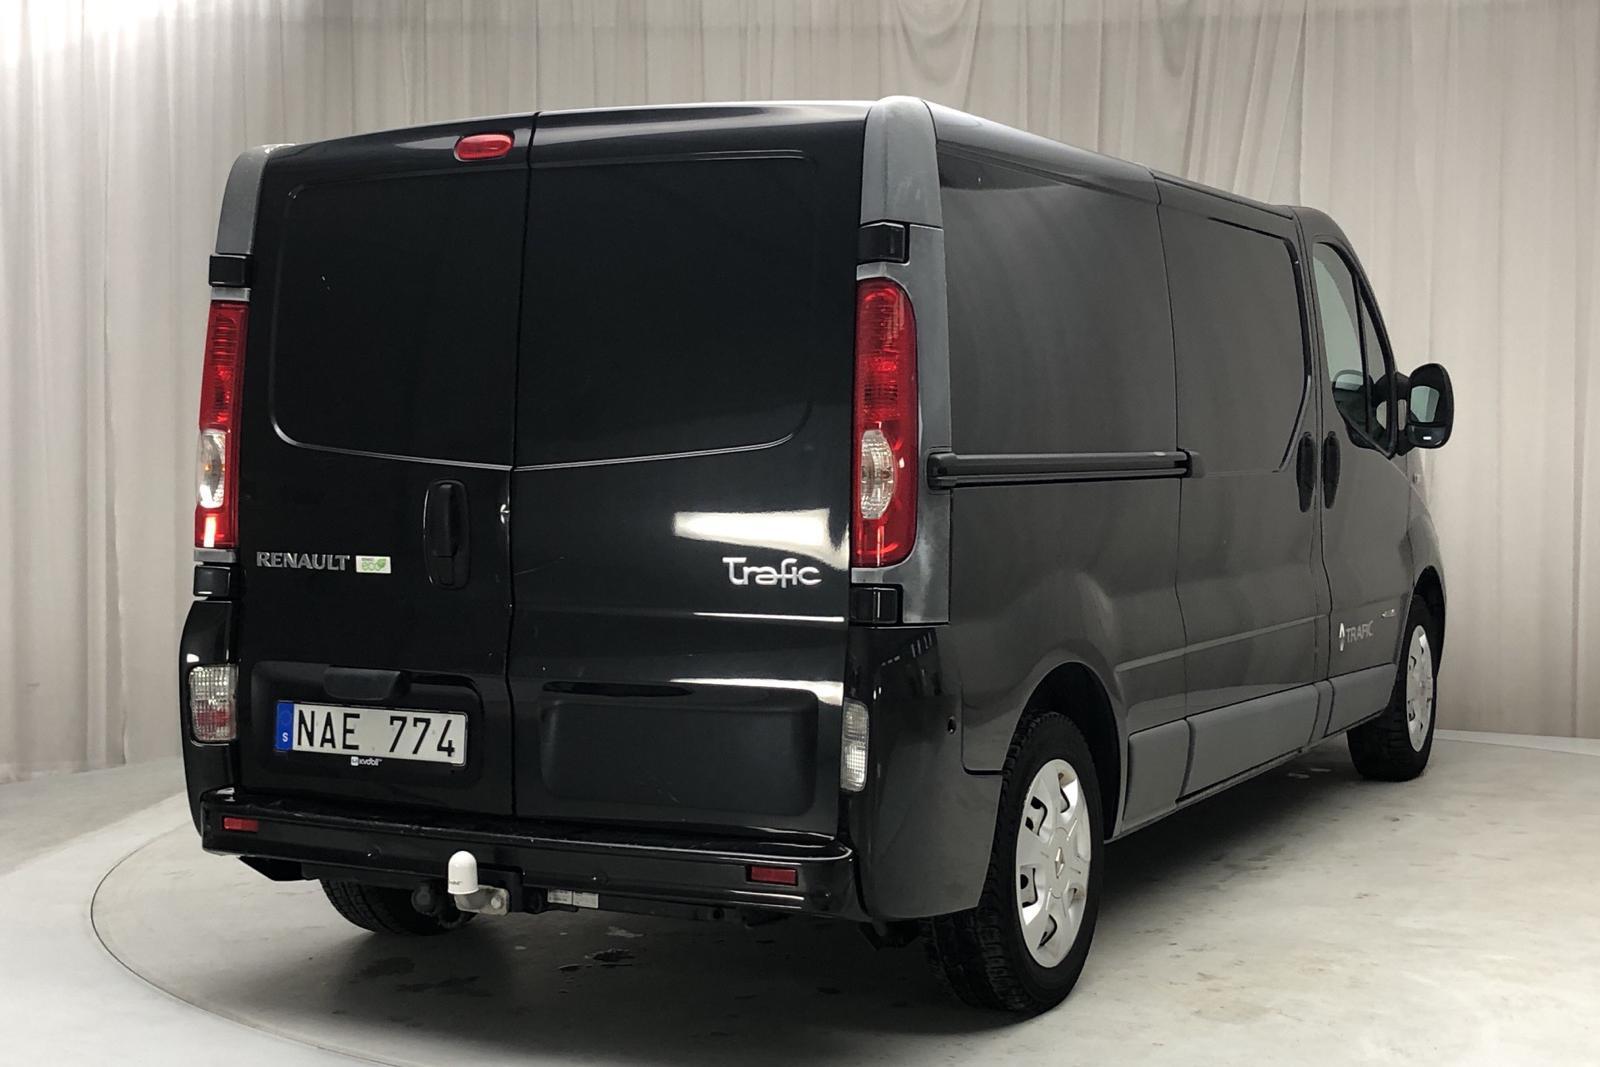 Renault Trafic 2.0 dCi Skåp/Buss (115hk) - 0 km - Manual - black - 2013